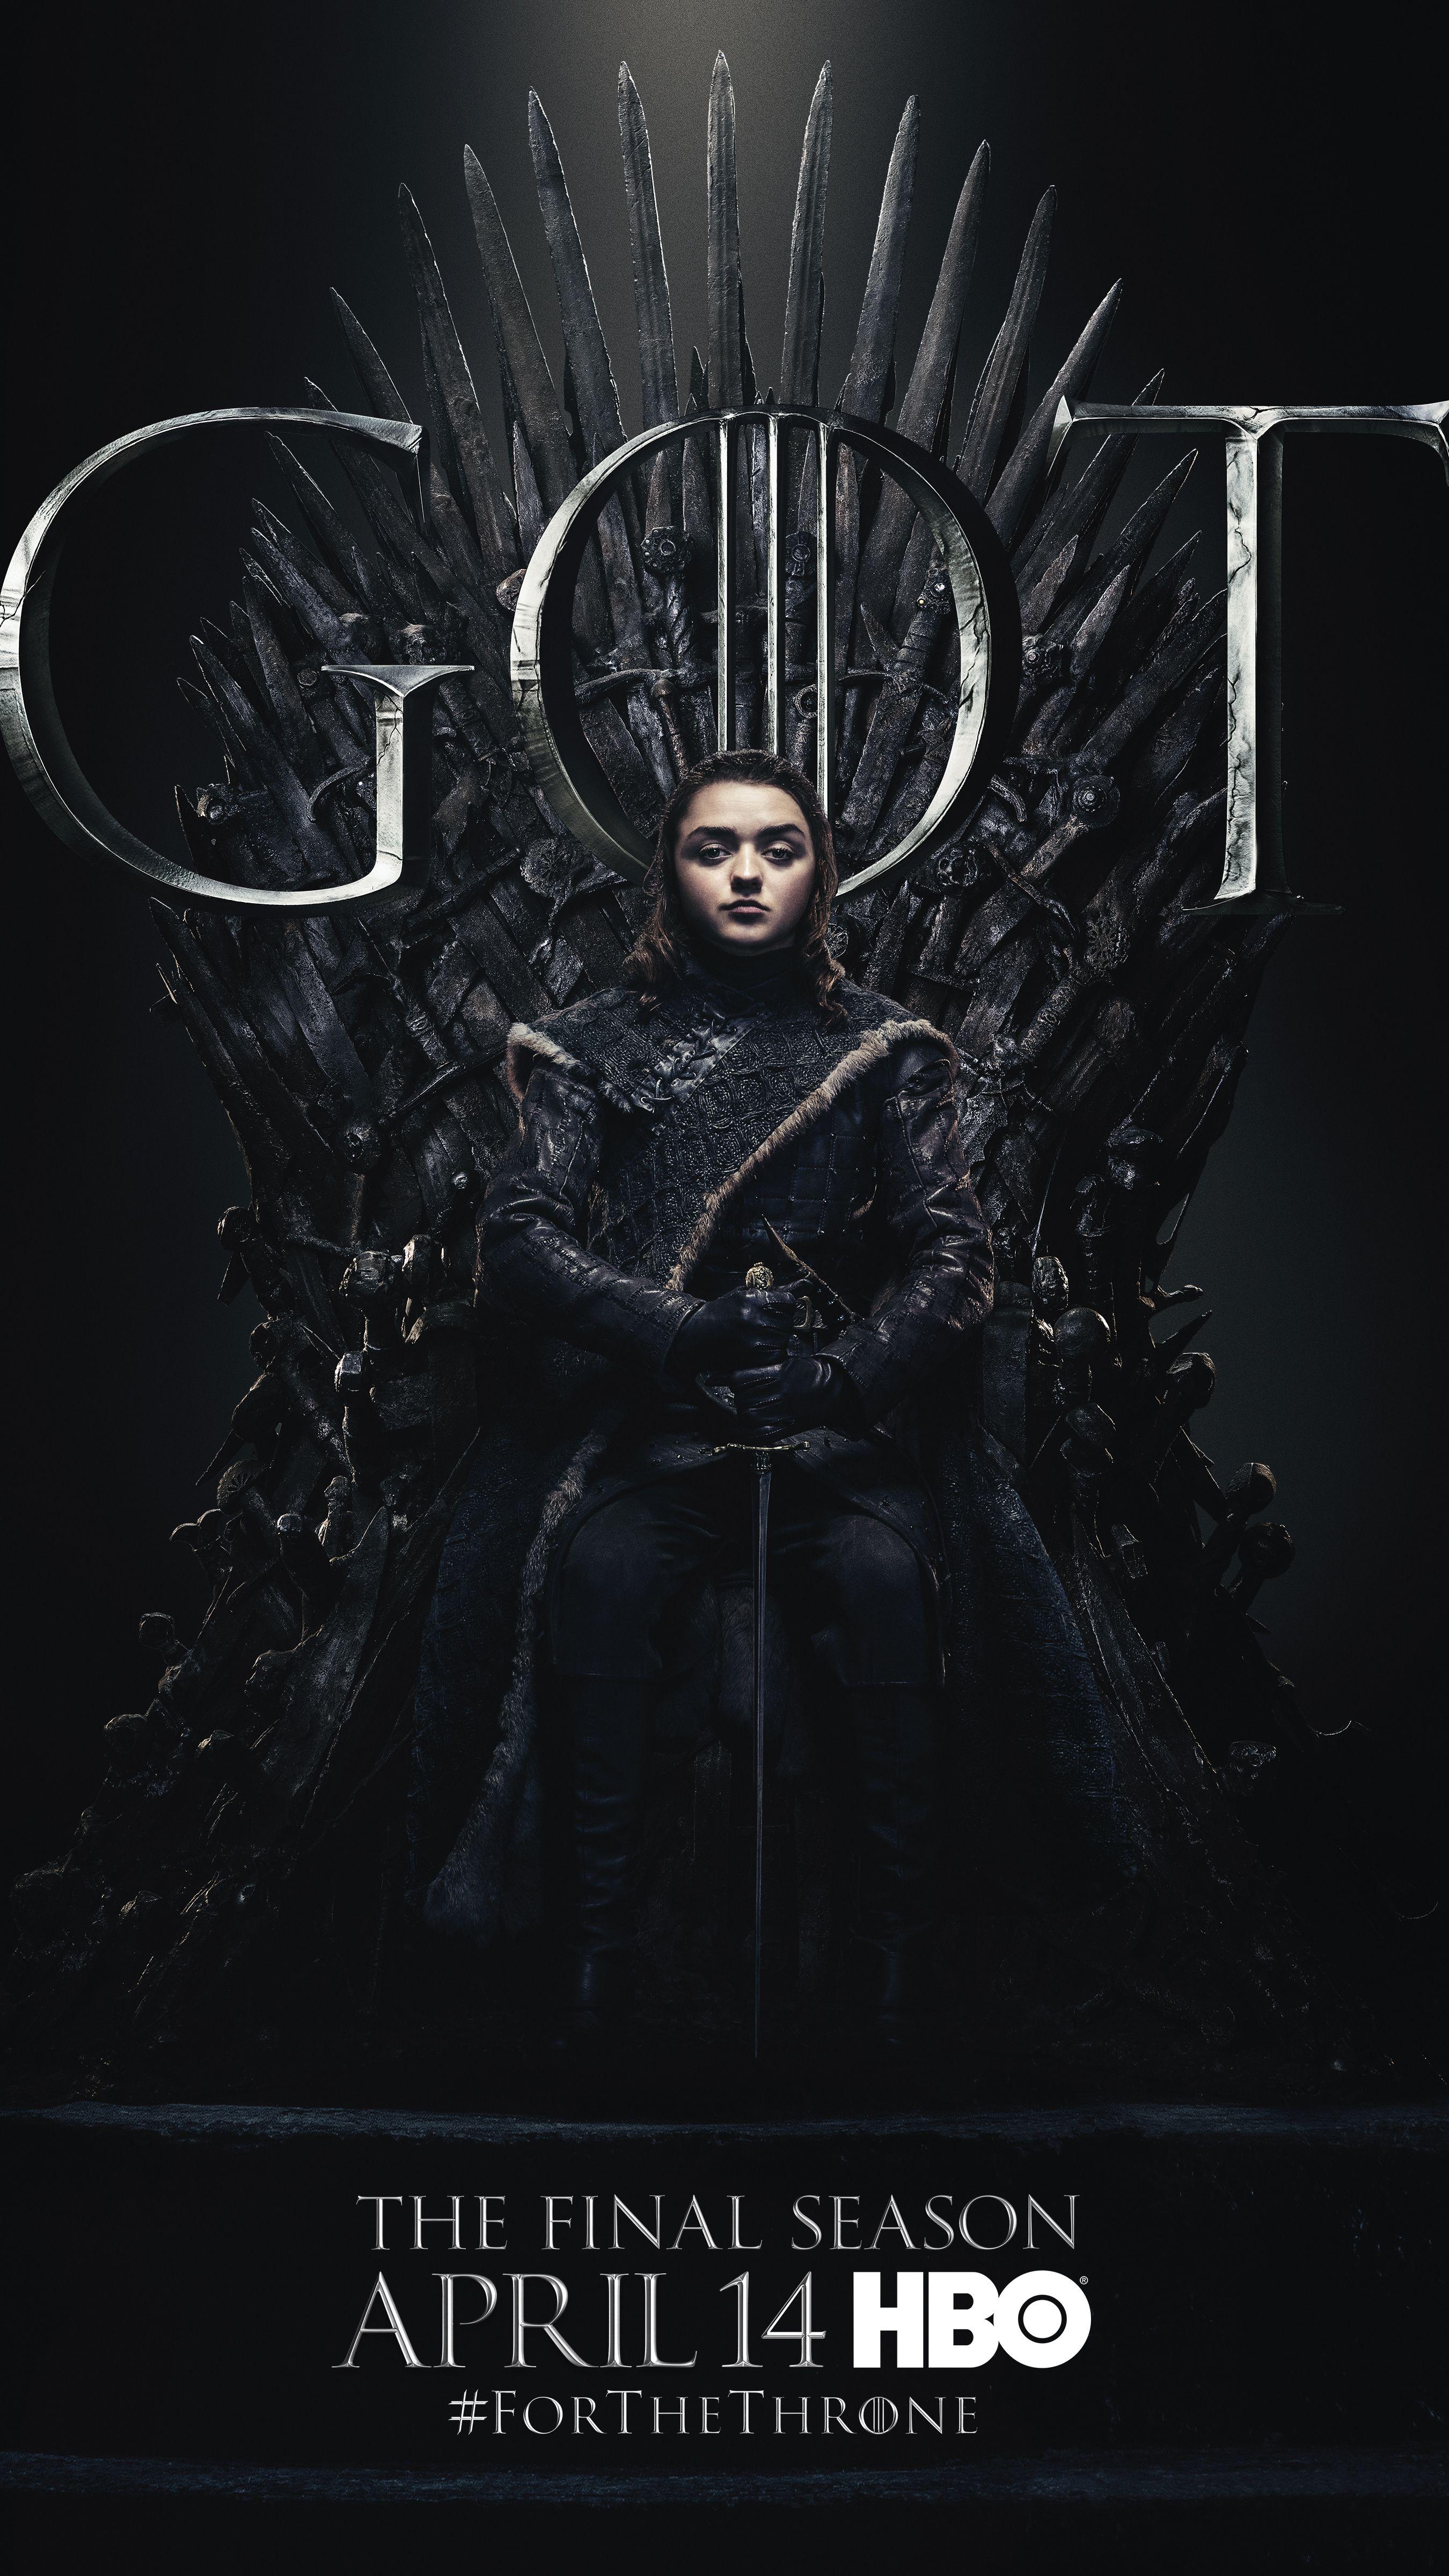 Game Of Thrones Saison 8 Episode 5 Streaming Vf Gratuit : thrones, saison, episode, streaming, gratuit, Games, Thrones, Saison, Episode, Streaming, Klewer